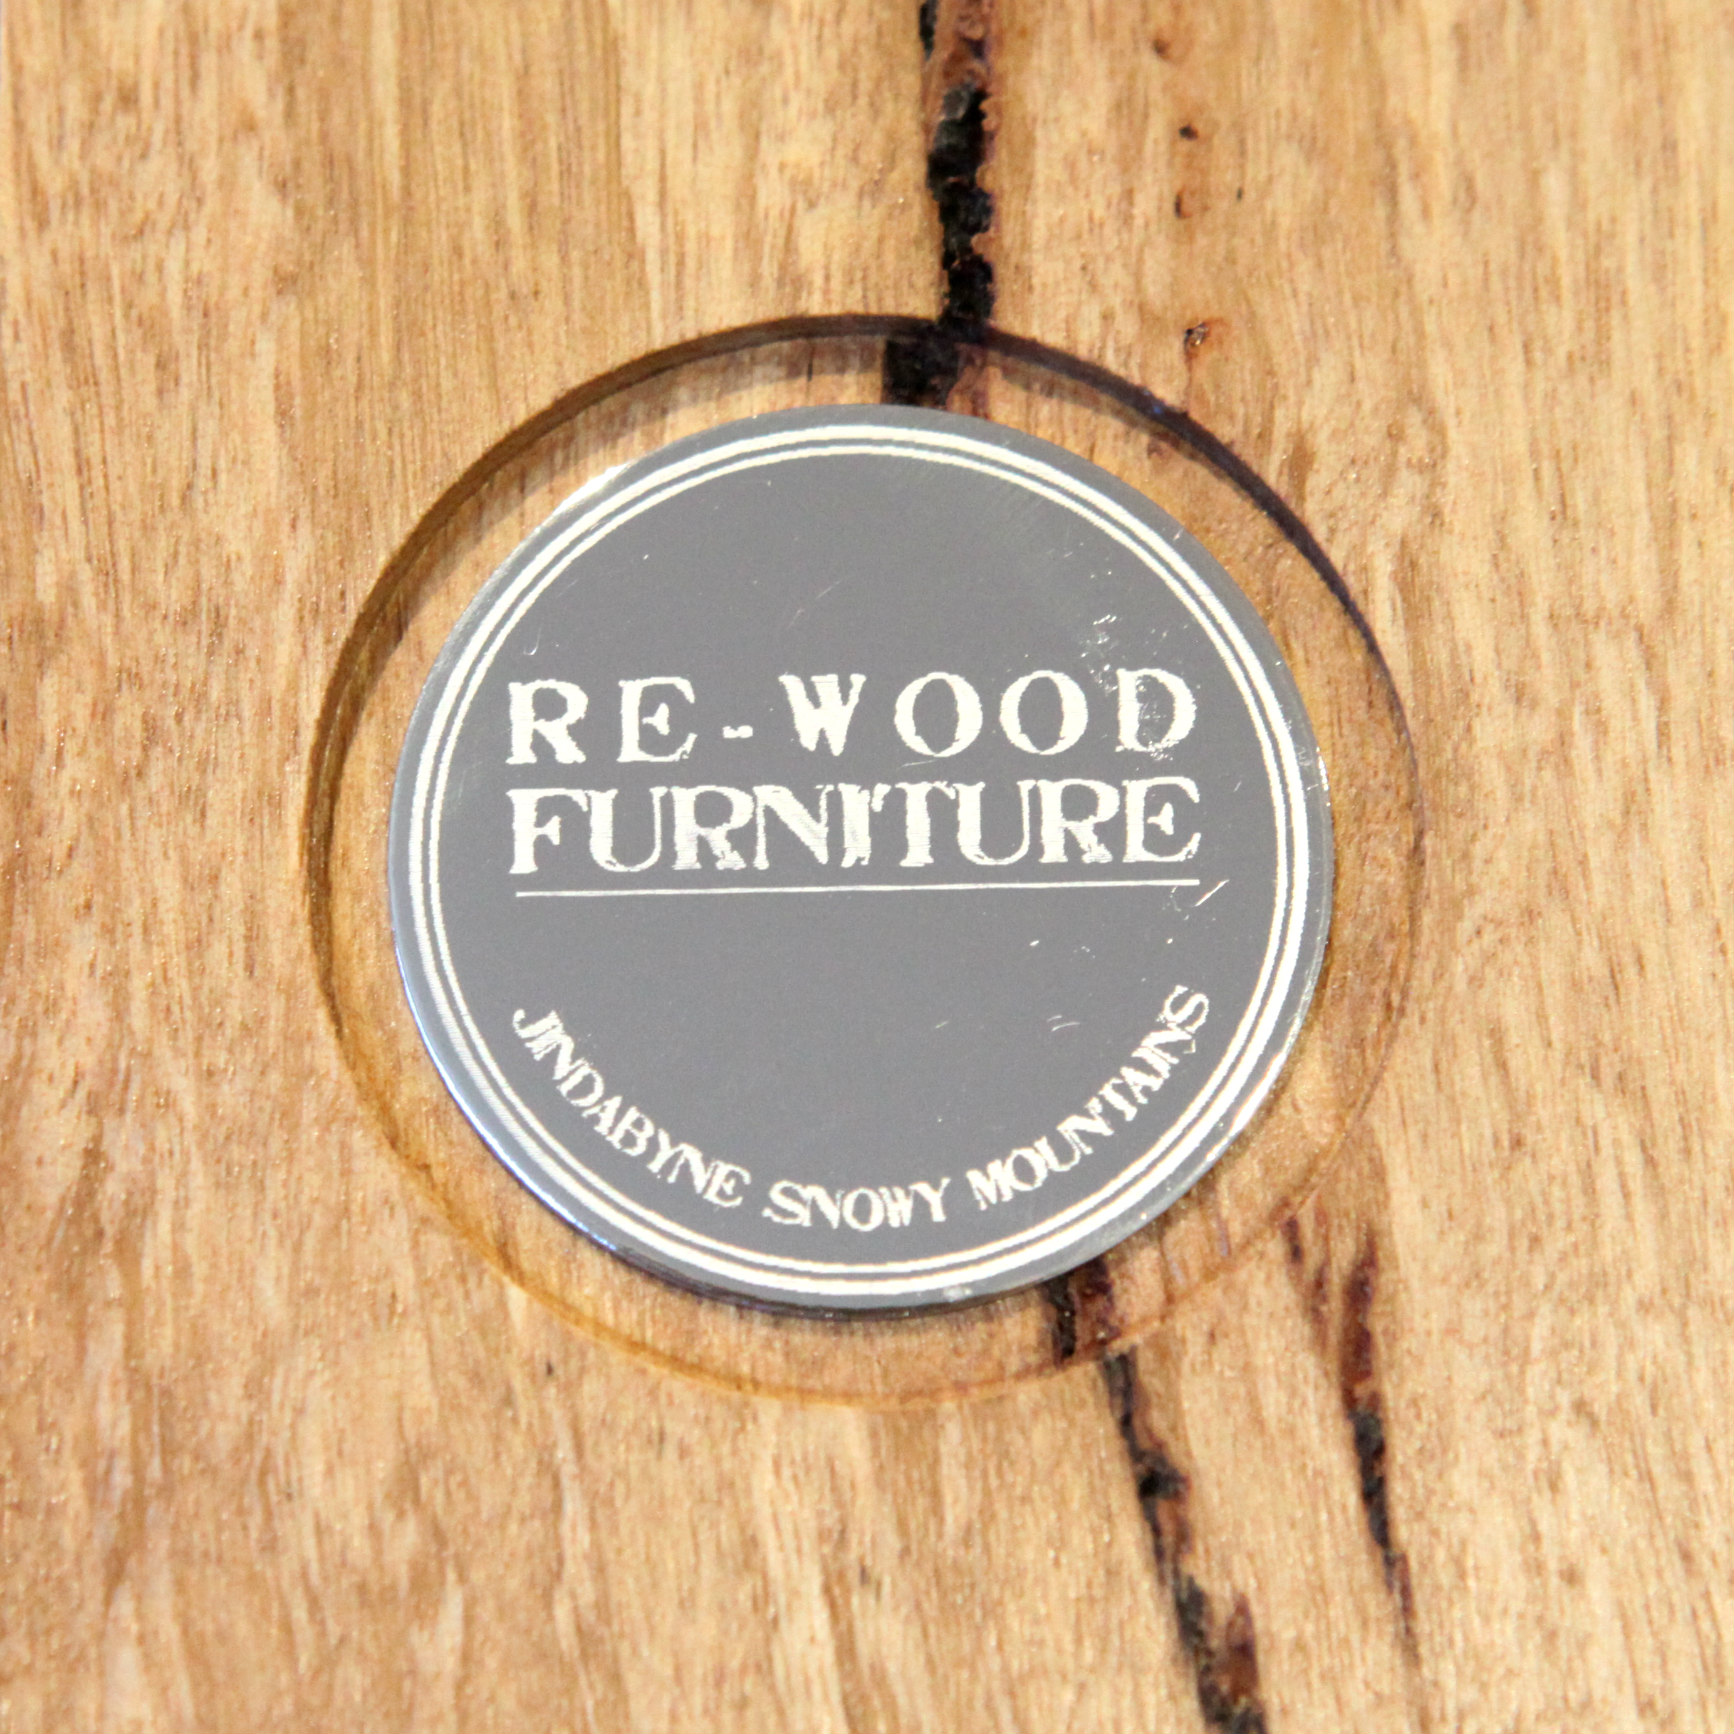 rewoodlogo2.jpg